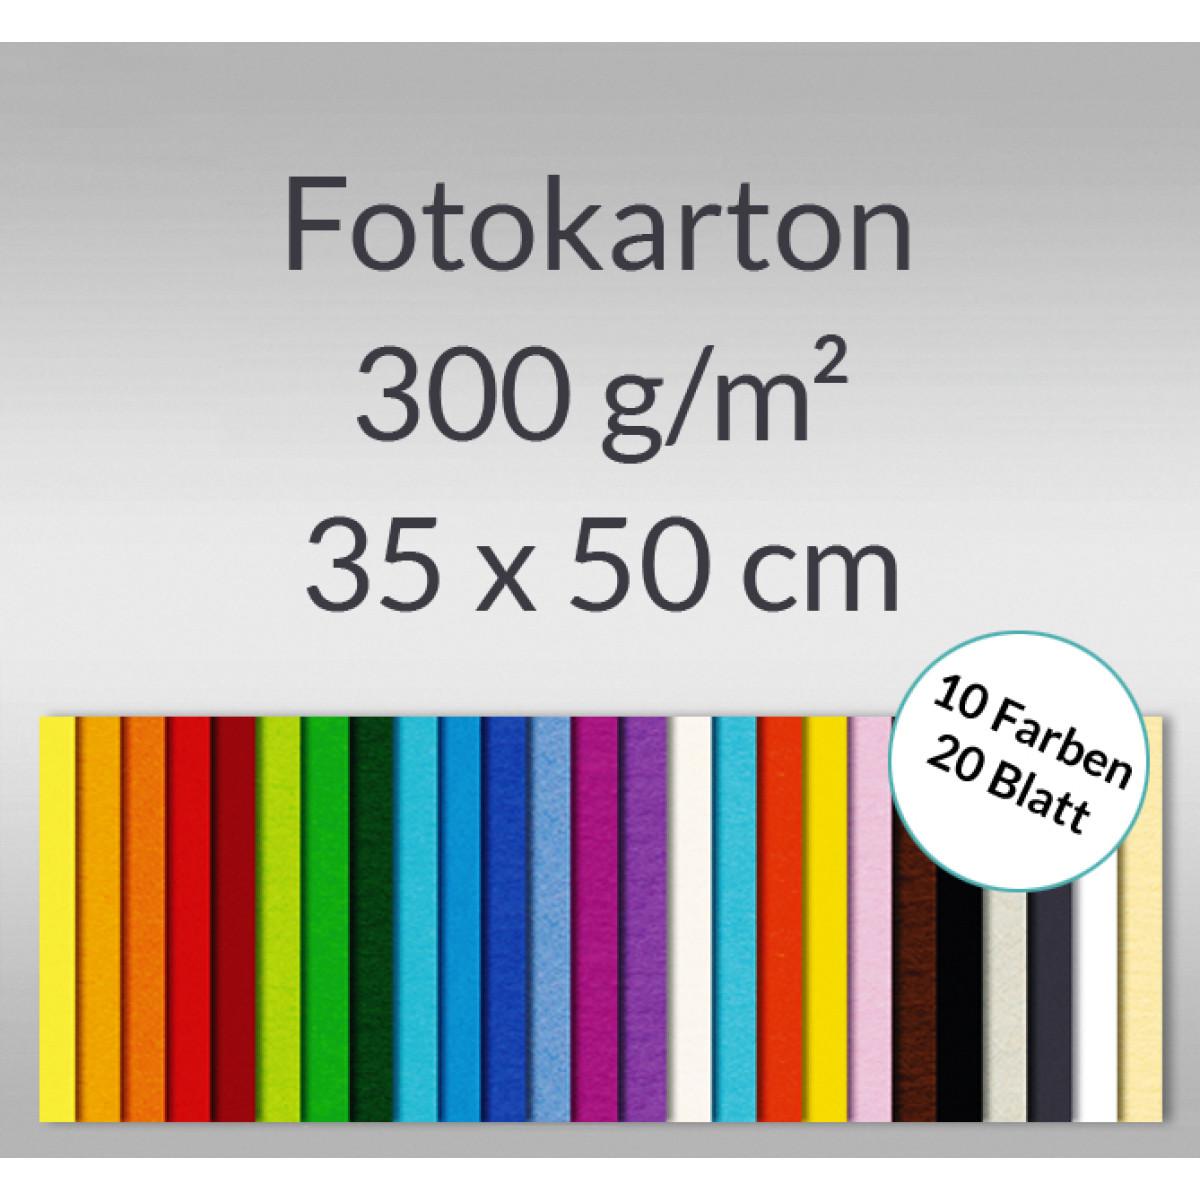 Fotokarton 35 x 50 cm - 20 Blatt in 10 Farben - Buntpapierwelt